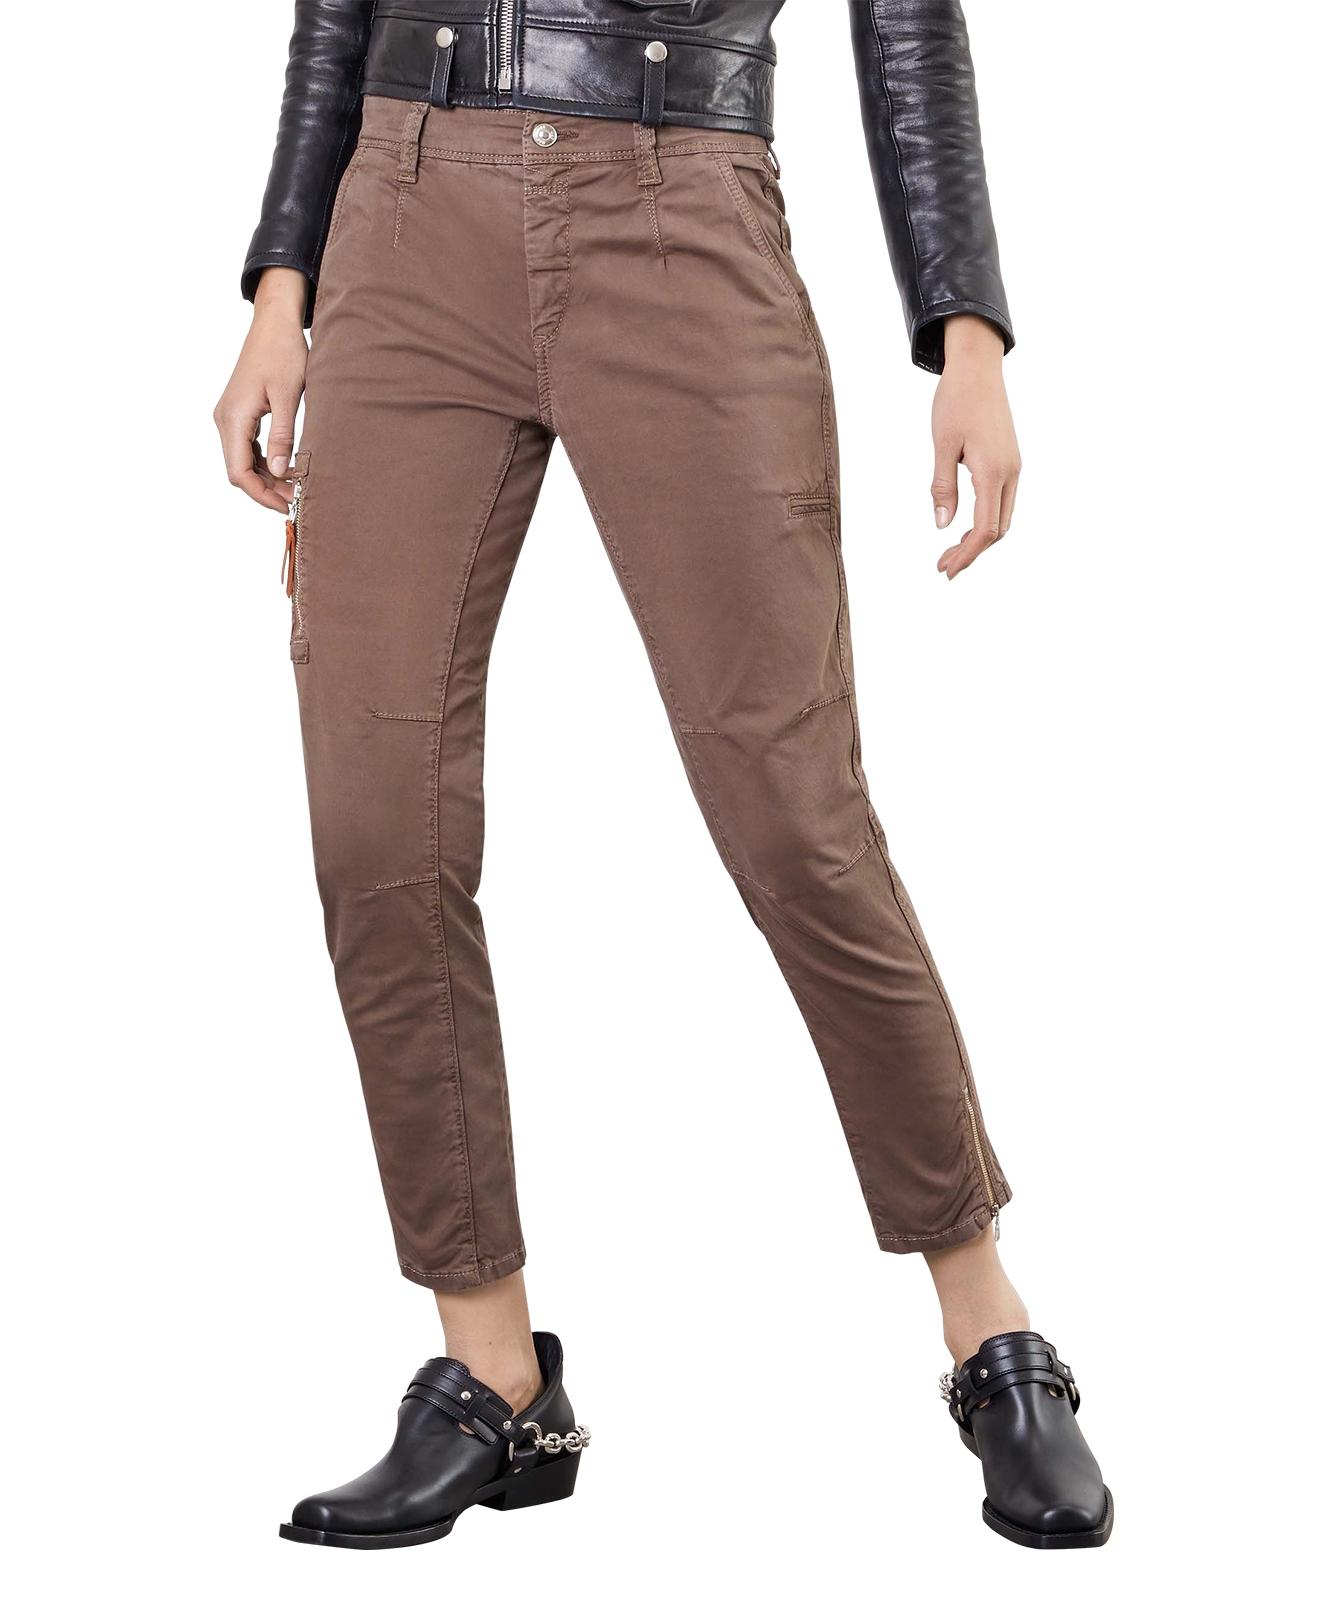 Hosen - Mac Rich Cargo Hose Relaxed Slim Fit in braunen Nutria  - Onlineshop Jeans Meile